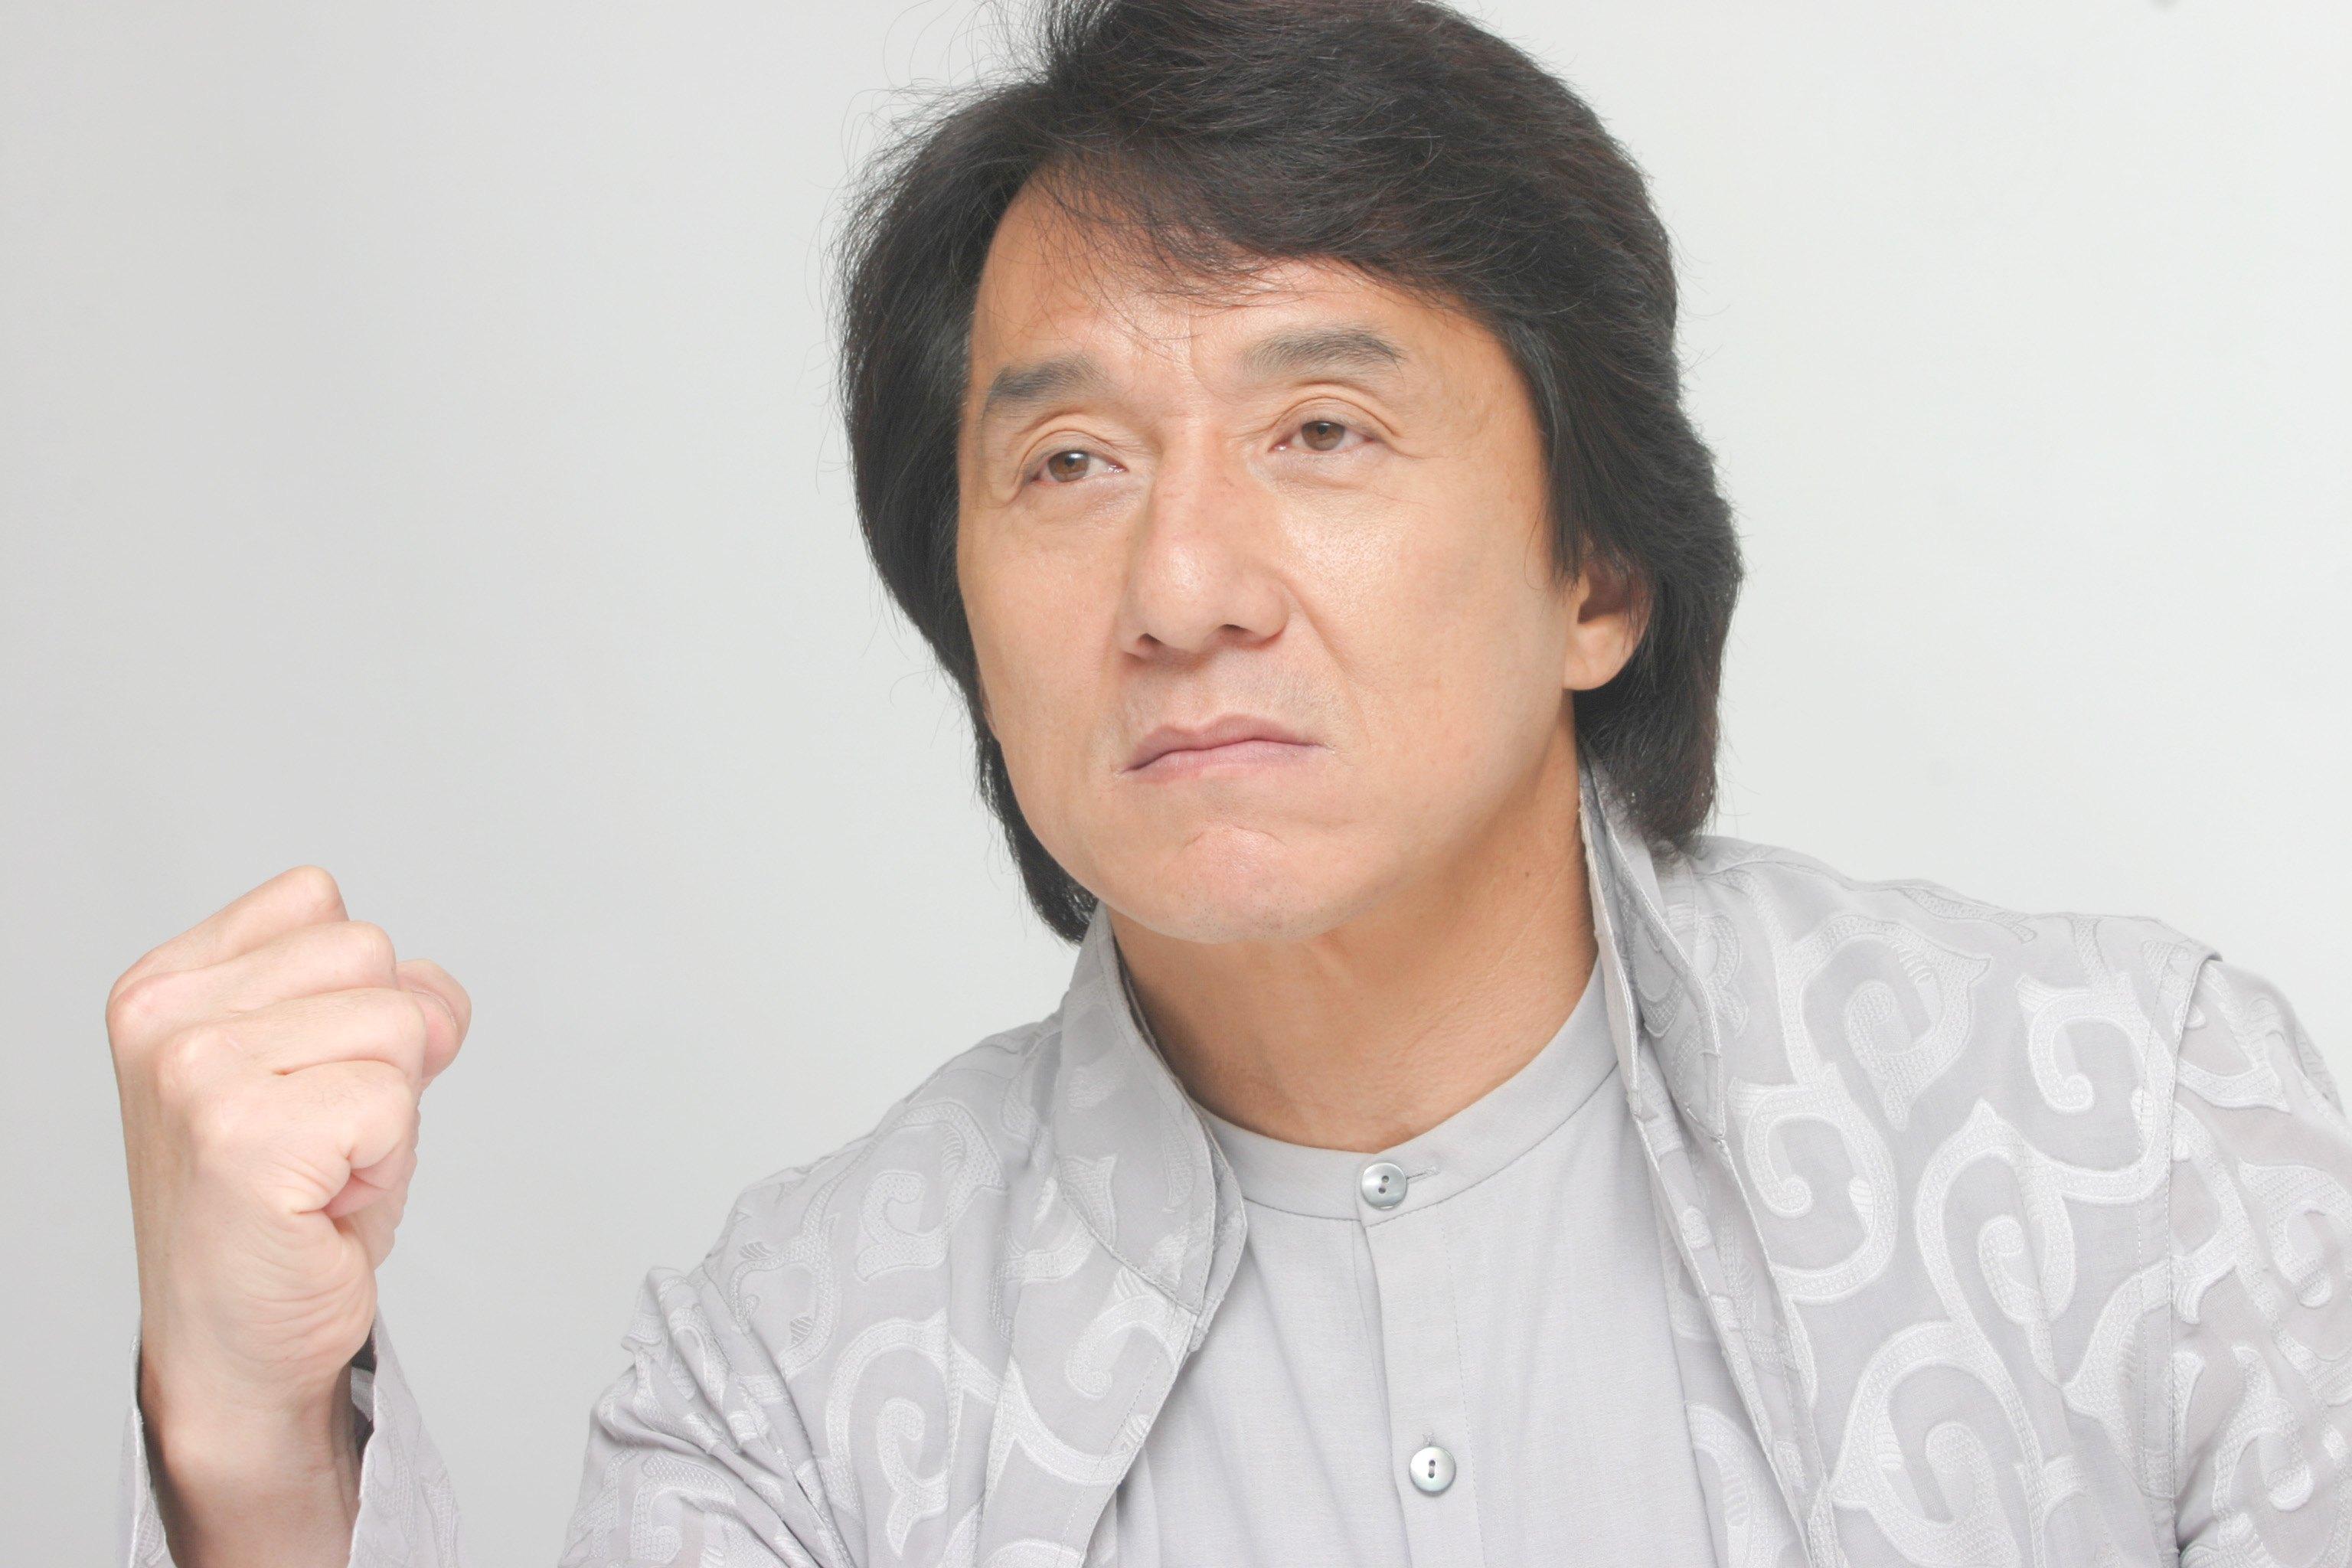 Jackie Chan Photo 5 Of 47 Pics Wallpaper Photo 123373